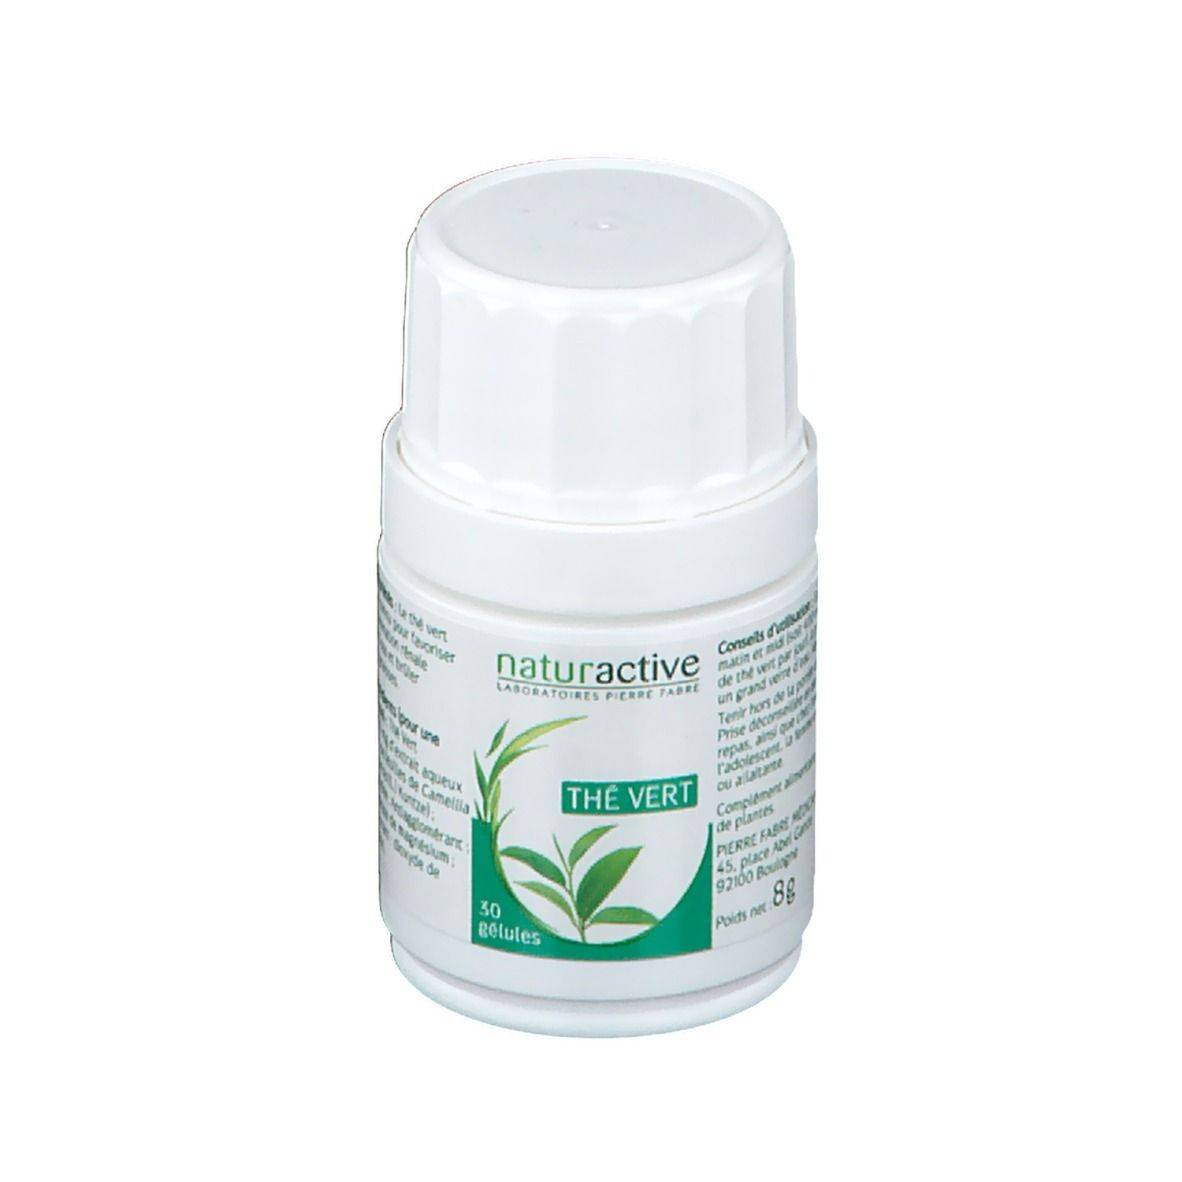 Naturactive Thé Vert pc(s) capsule(s)